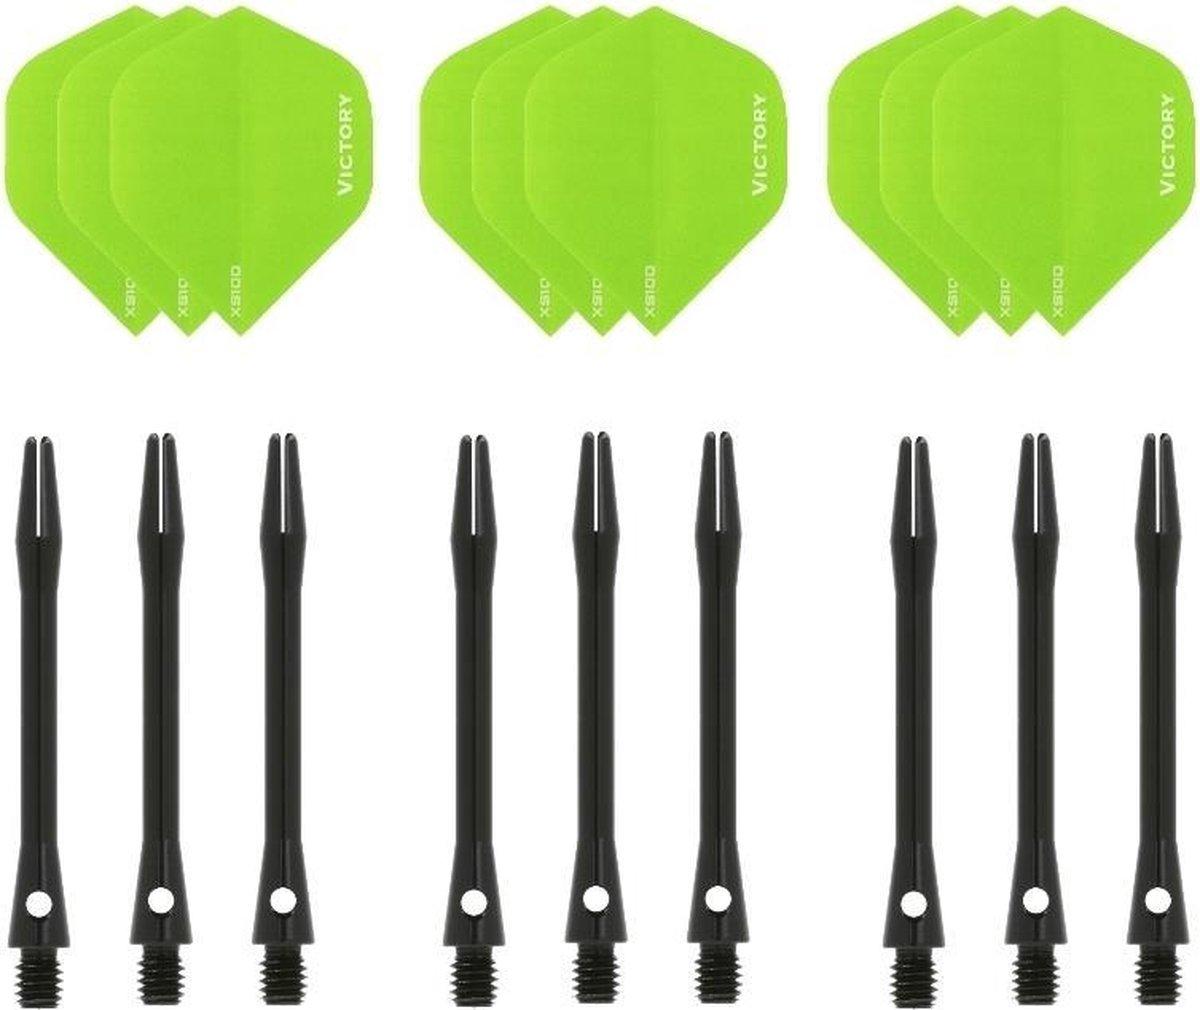 Dragon darts - 3 sets - XS100 Poly - Groen - Darts flights - plus 3 sets - aluminium - darts shafts - zwart - medium